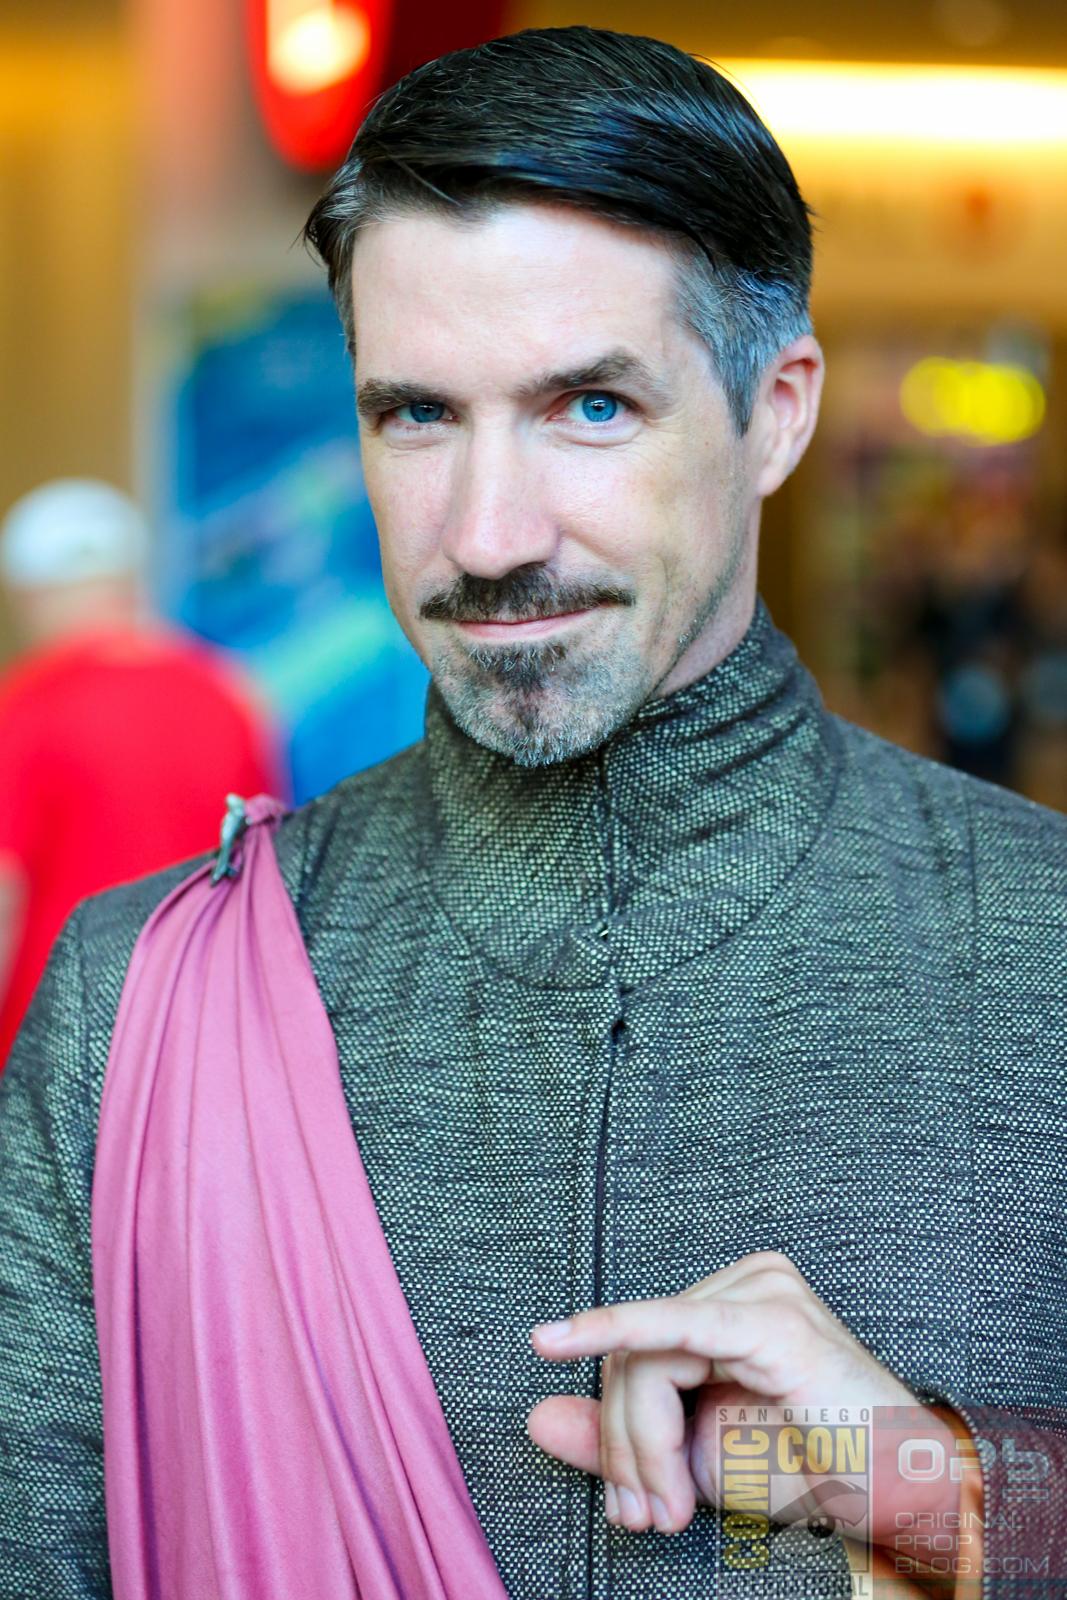 2014 San Diego Comic-Con Cosplay